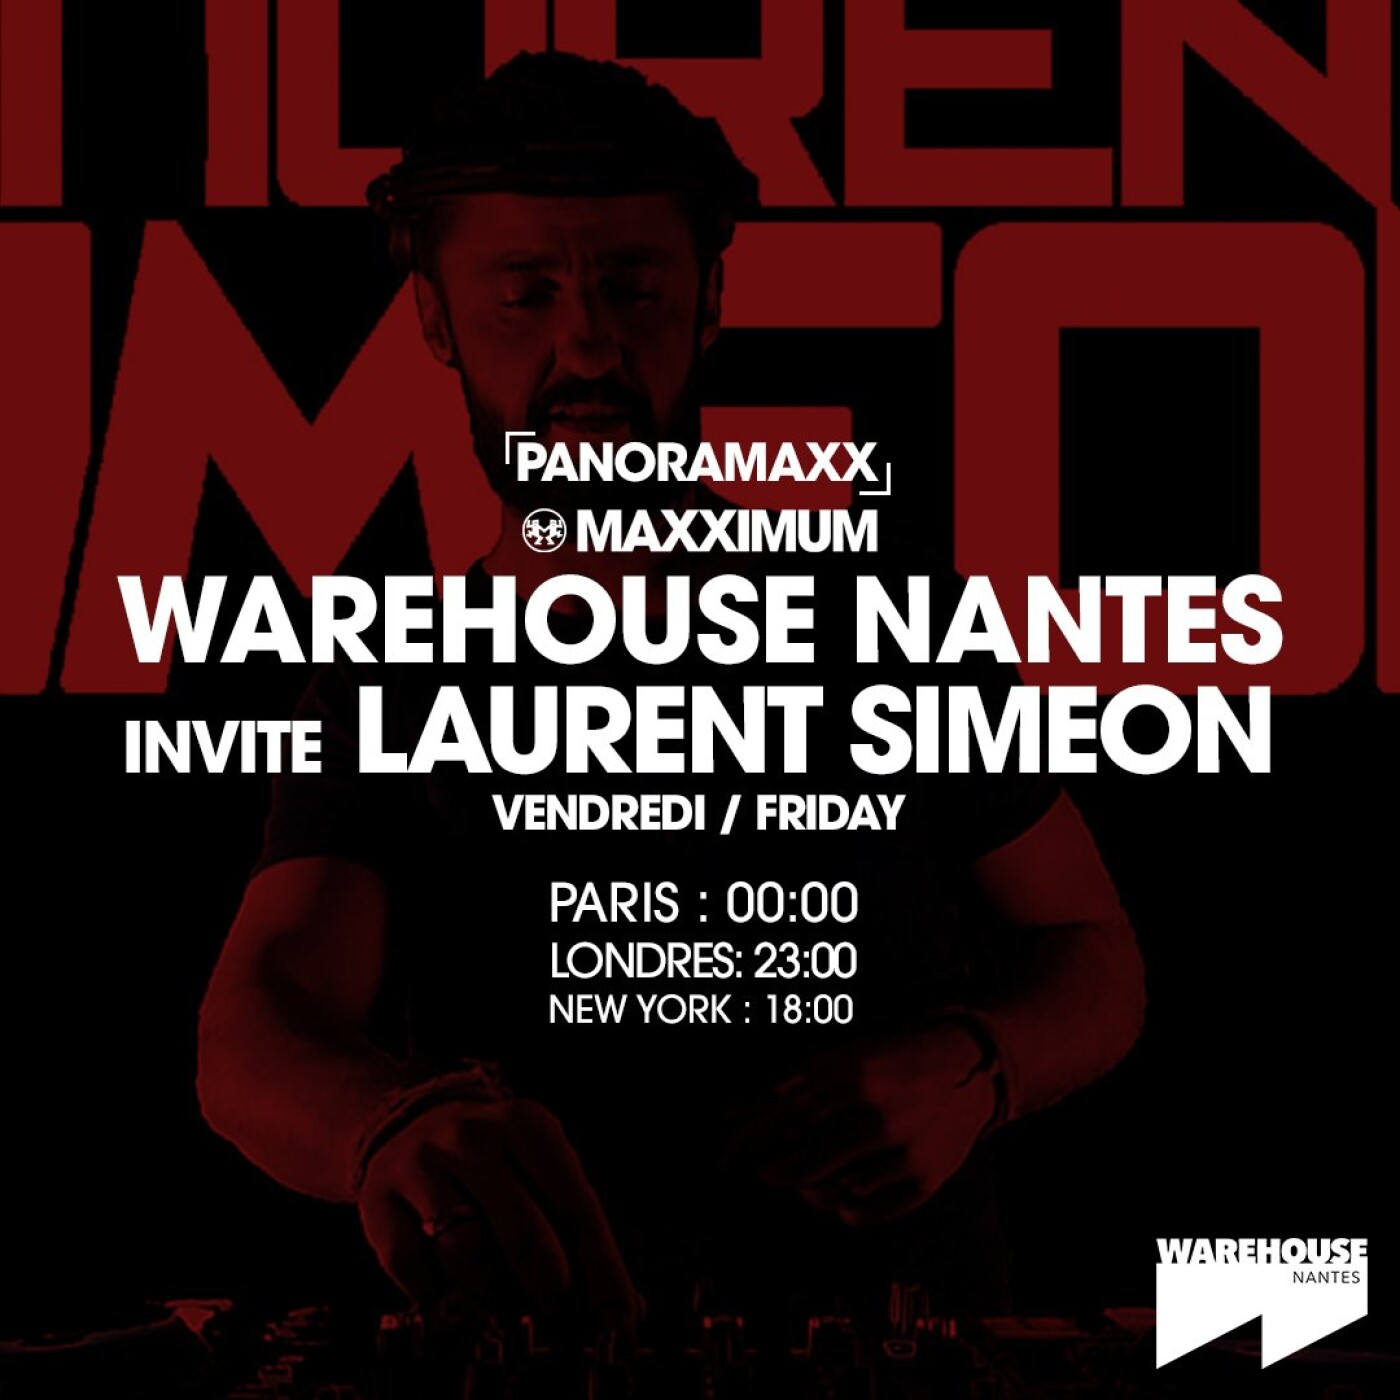 PANORAMAXX : WAREHOUSE DE NANTES INVITE LAURENT SIMEON